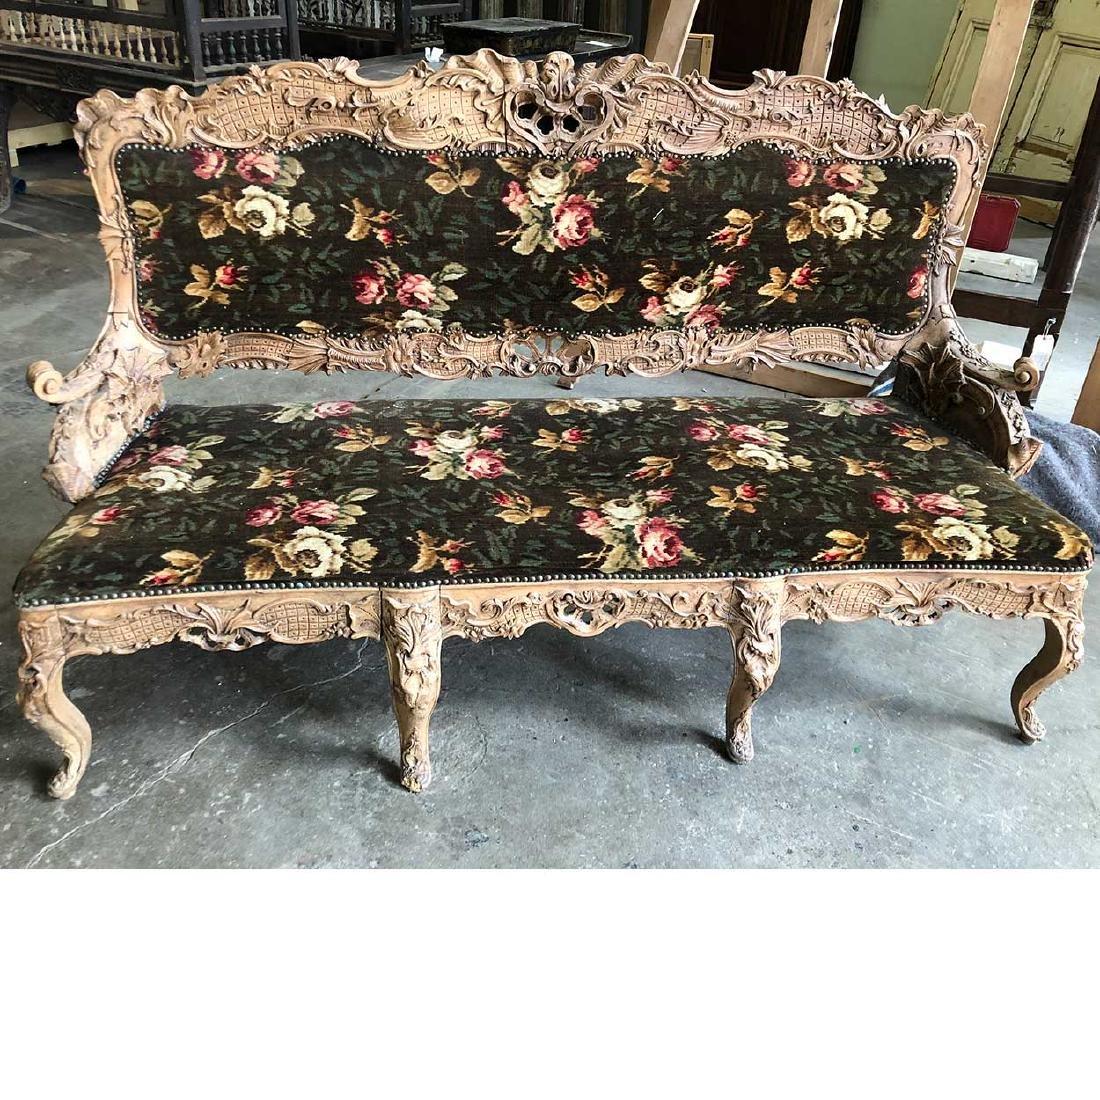 Danish Rococo Revival Upholstered Settee